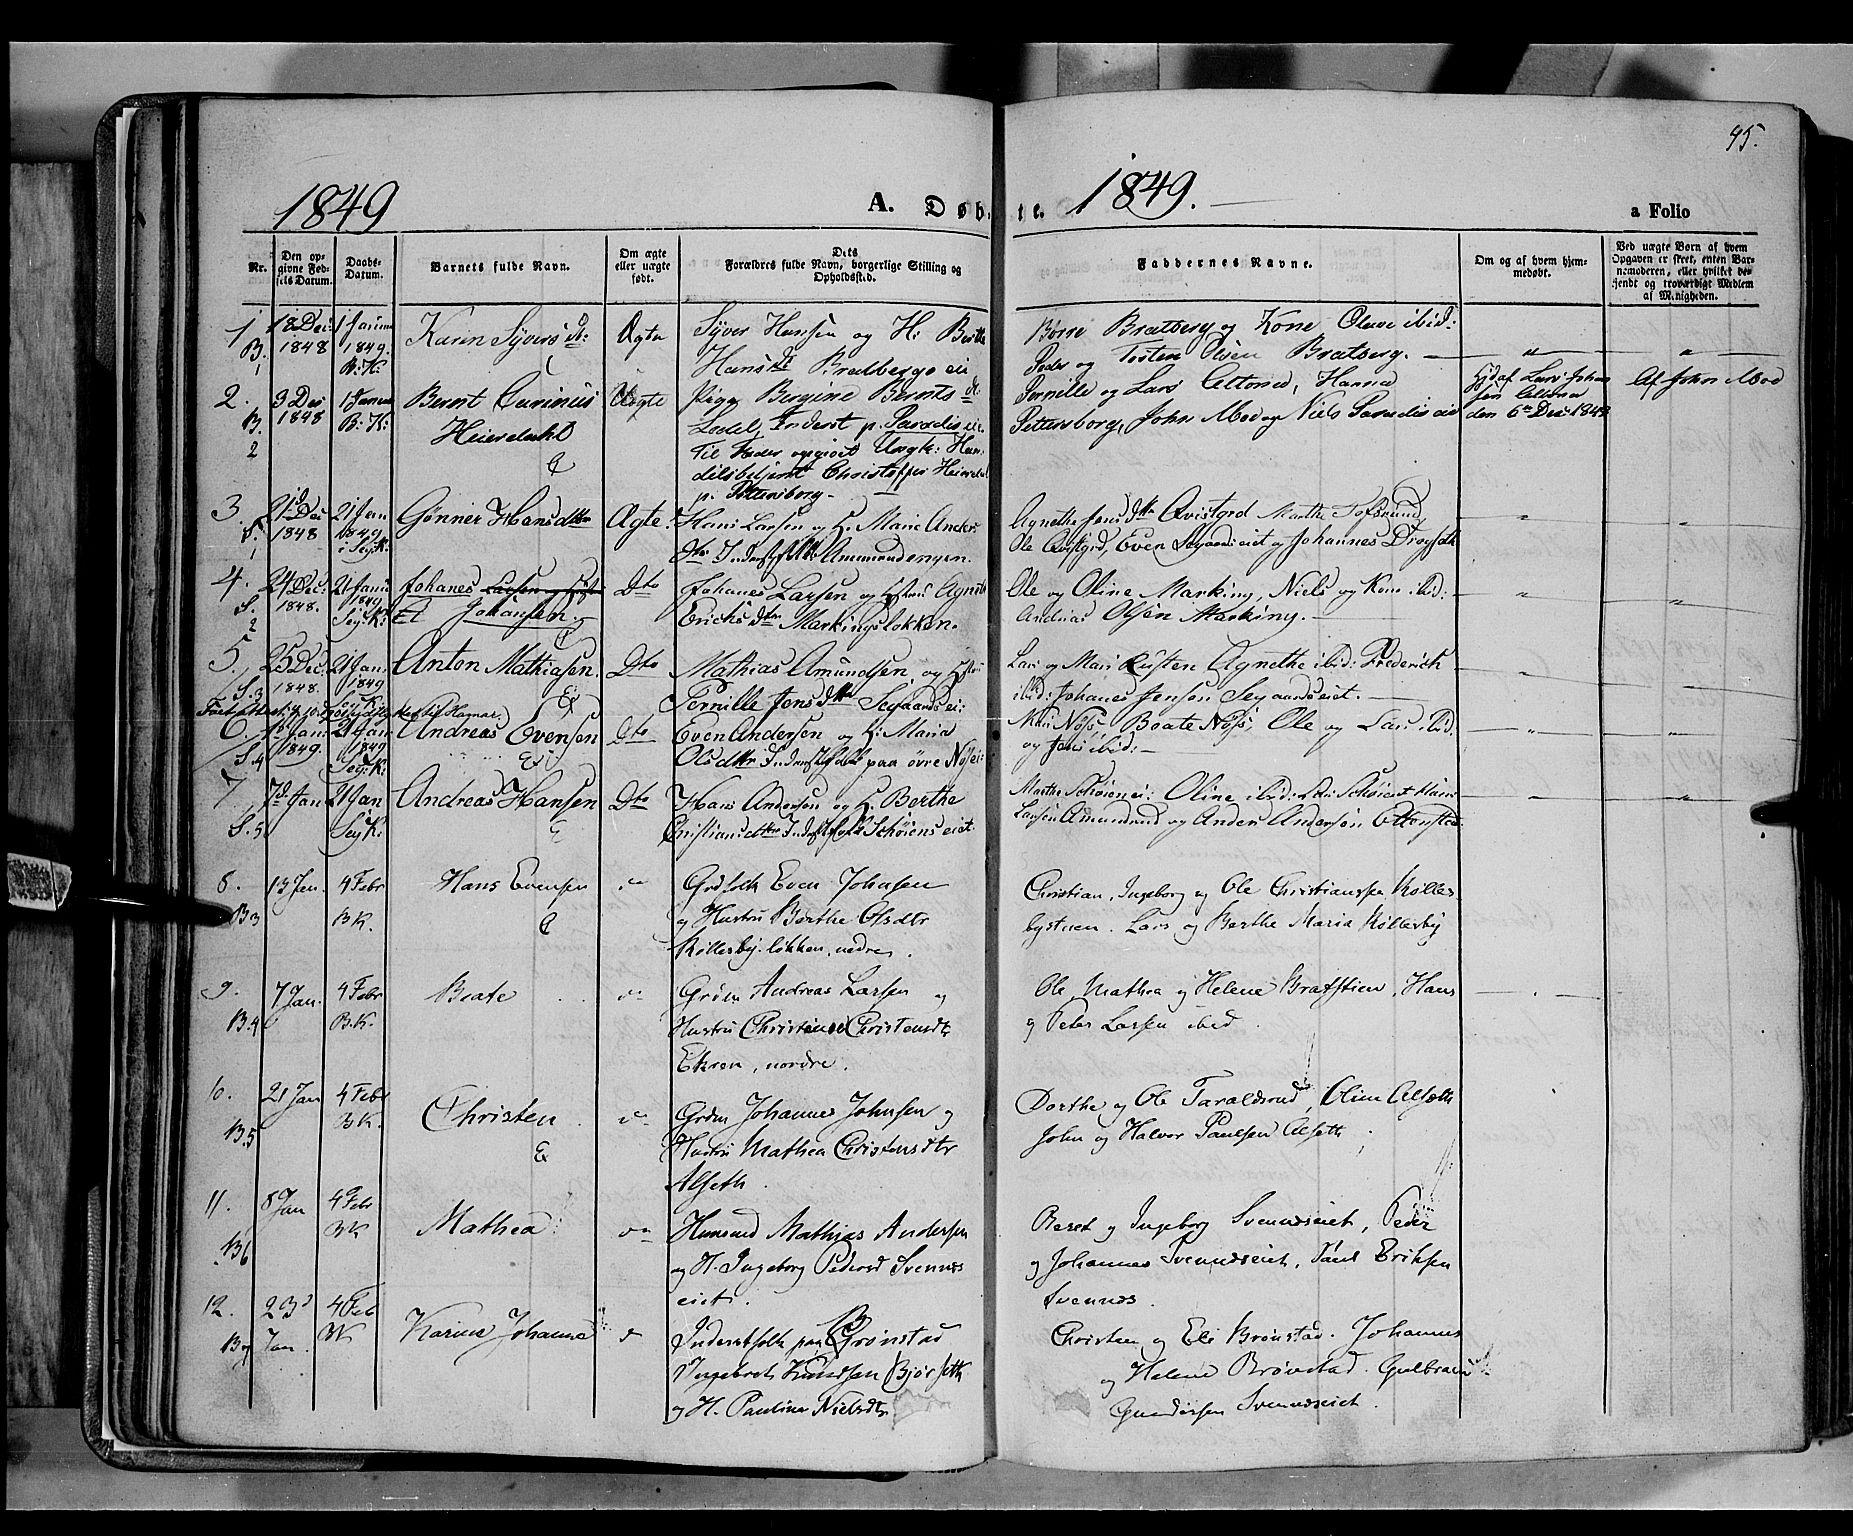 SAH, Biri prestekontor, Ministerialbok nr. 5, 1843-1854, s. 45